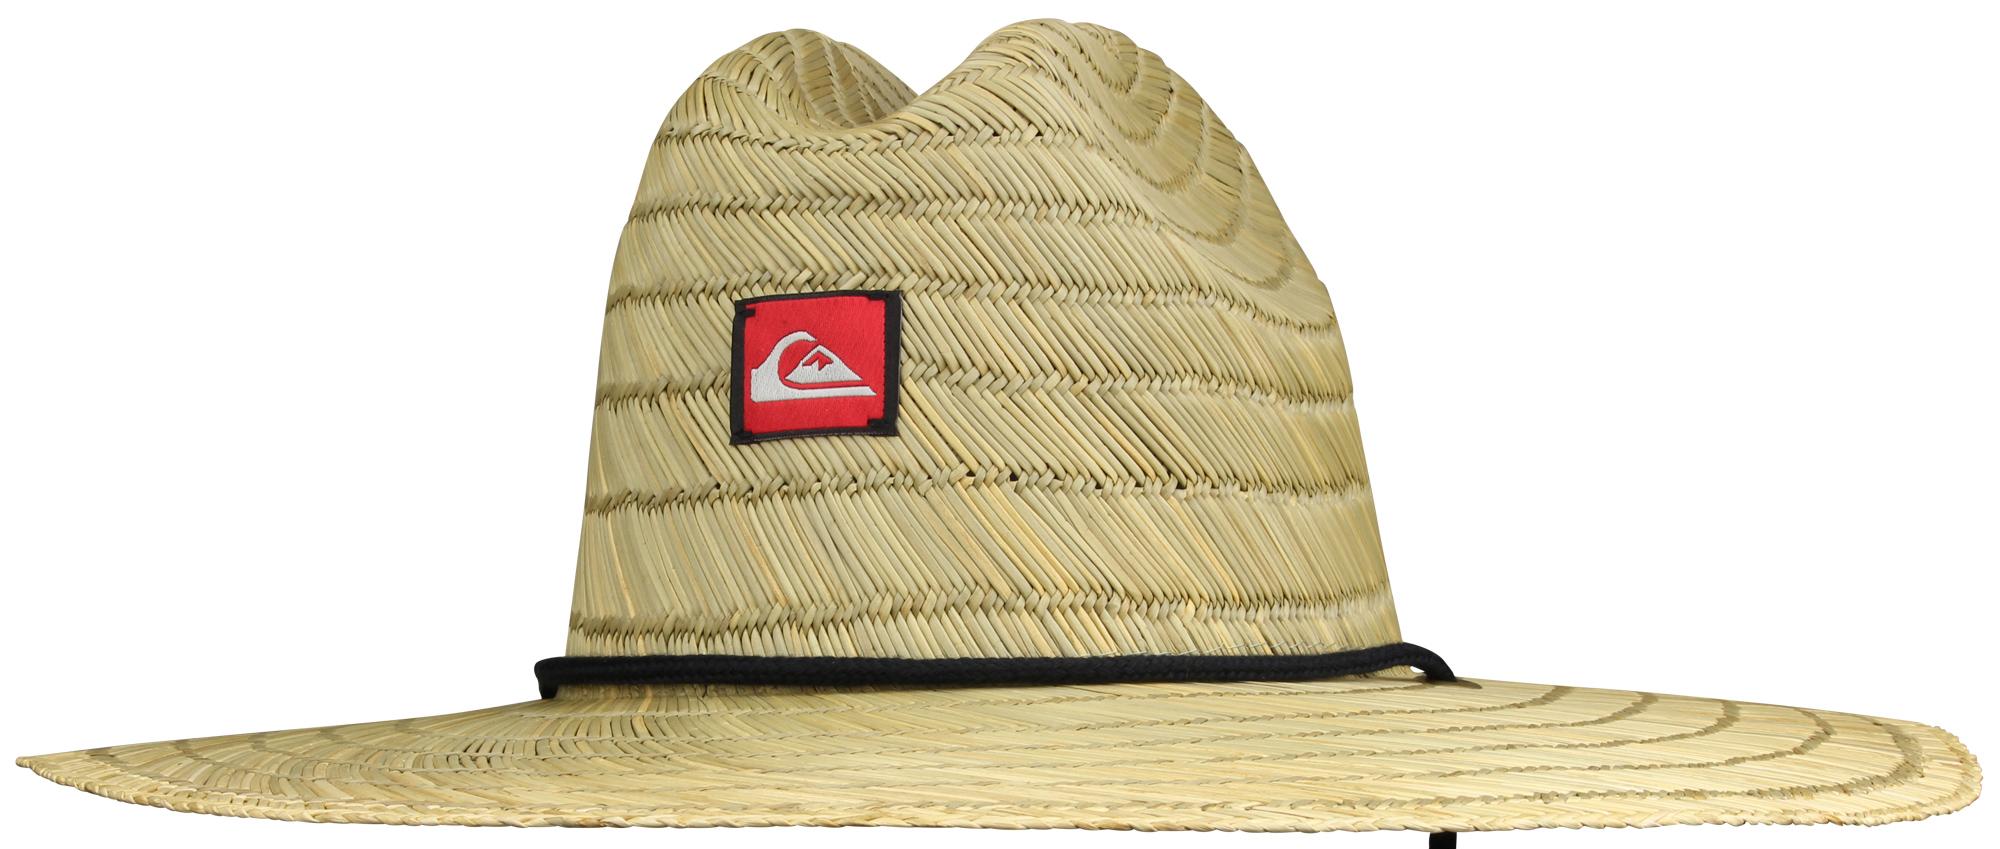 Quiksilver Mens Pierside Wide Brim Hat - Straw Brown  dba4ca15c29